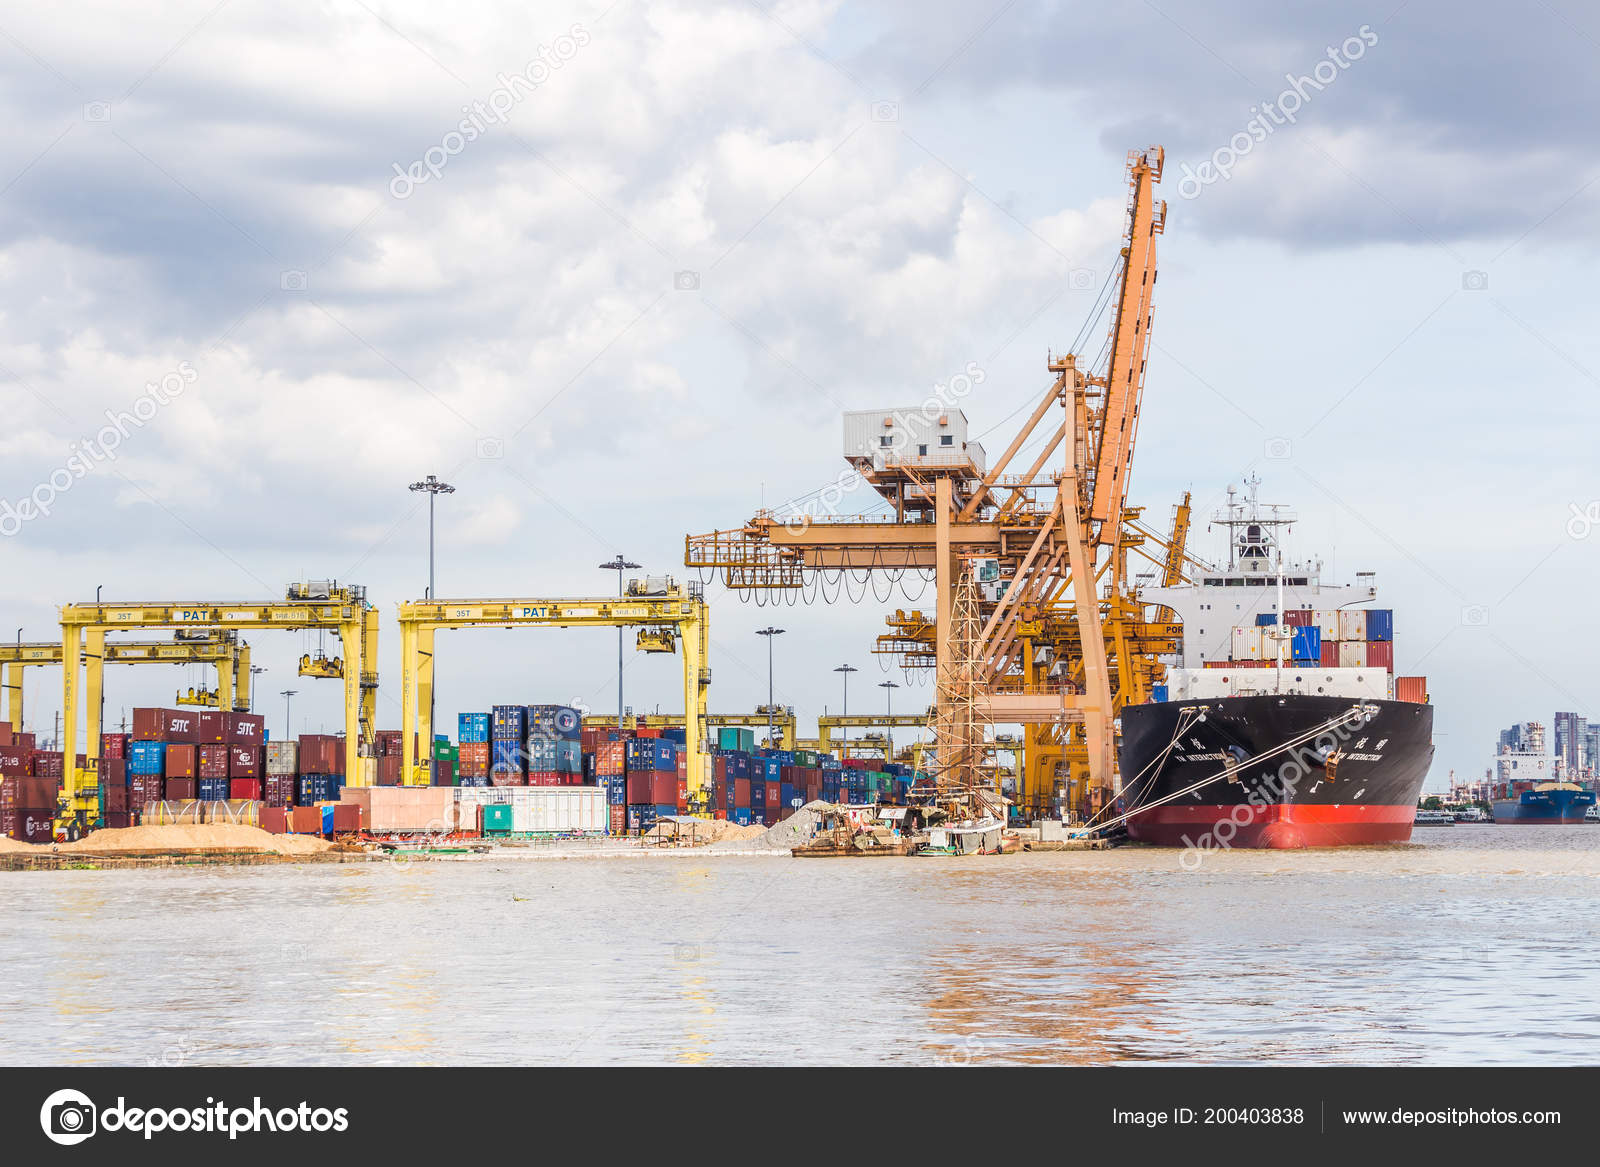 Bangkok Thailand September 2017 Industrial Business Loading